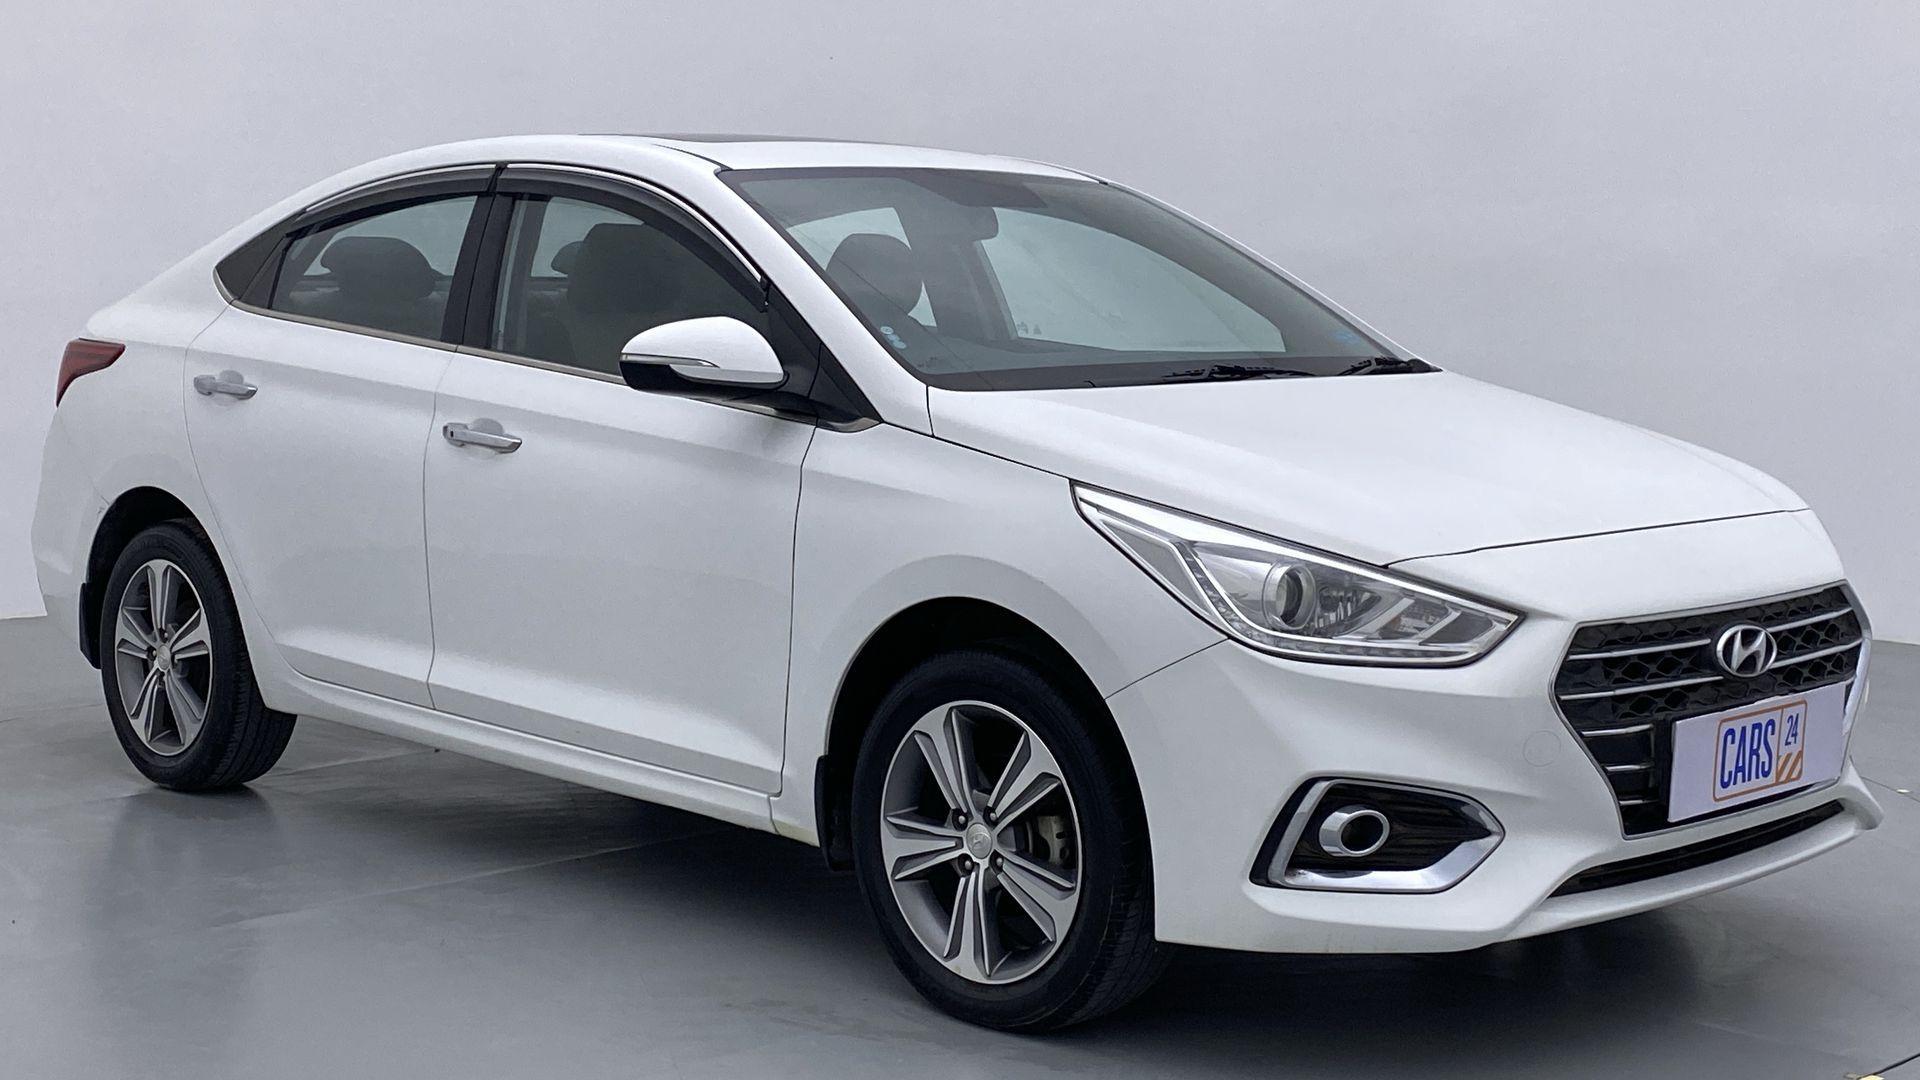 2019 Hyundai Verna 1.6 SX VTVT AT (O)